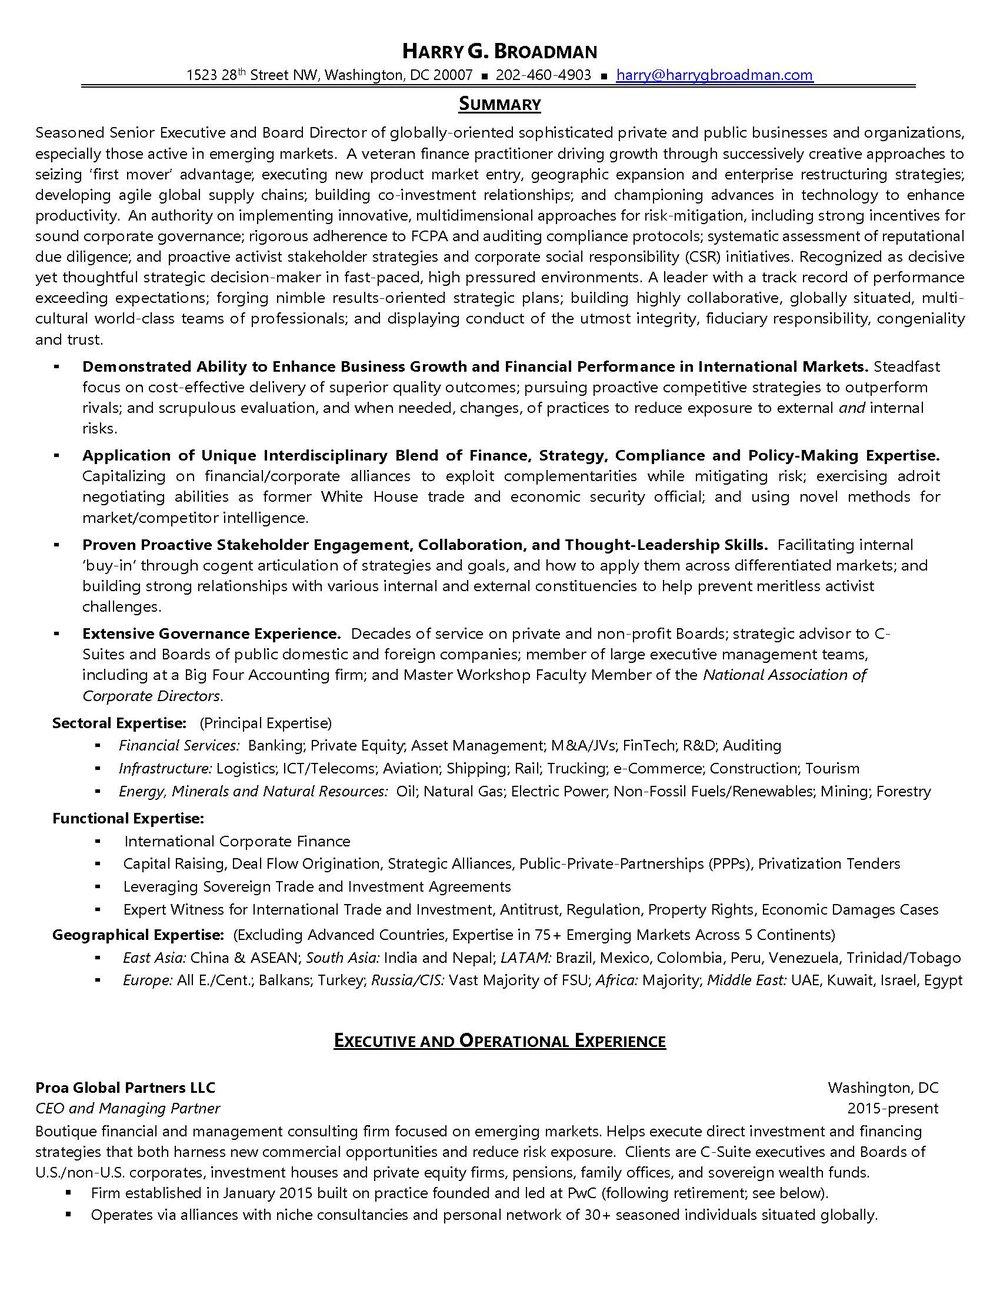 Broadman Detailed CV 3-21-18_Page_1.jpg